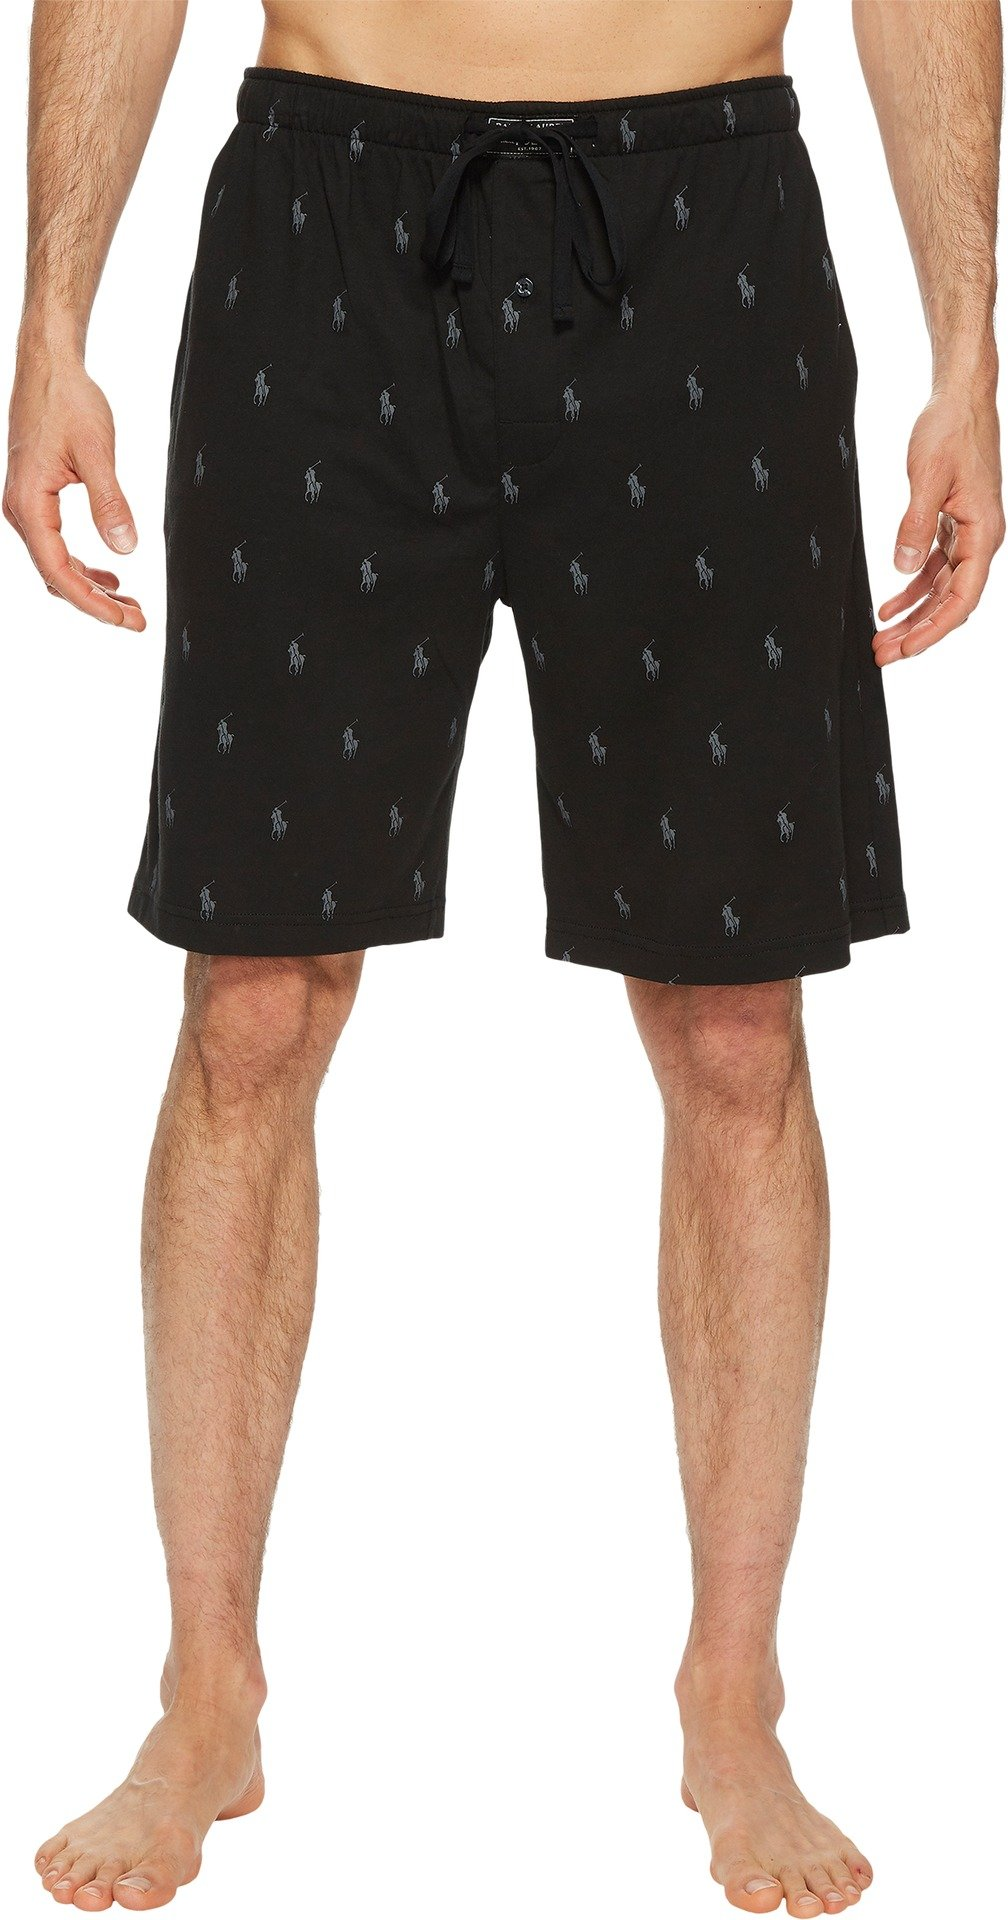 Polo Ralph Lauren Knit Sleep Shorts, L, Polo Black